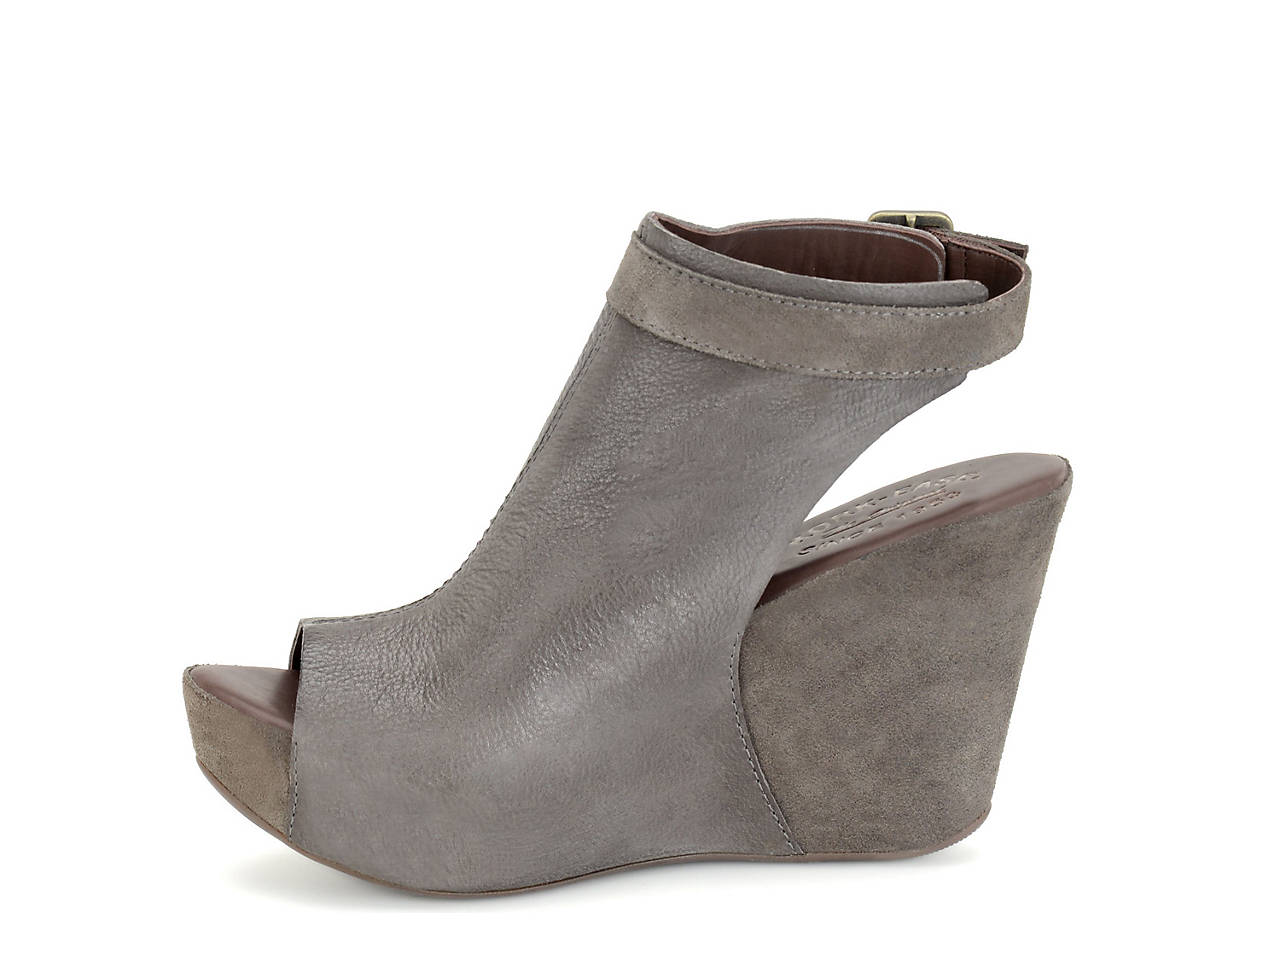 a8c748f6c419 Kork-Ease Berit Wedge Sandal Women s Shoes